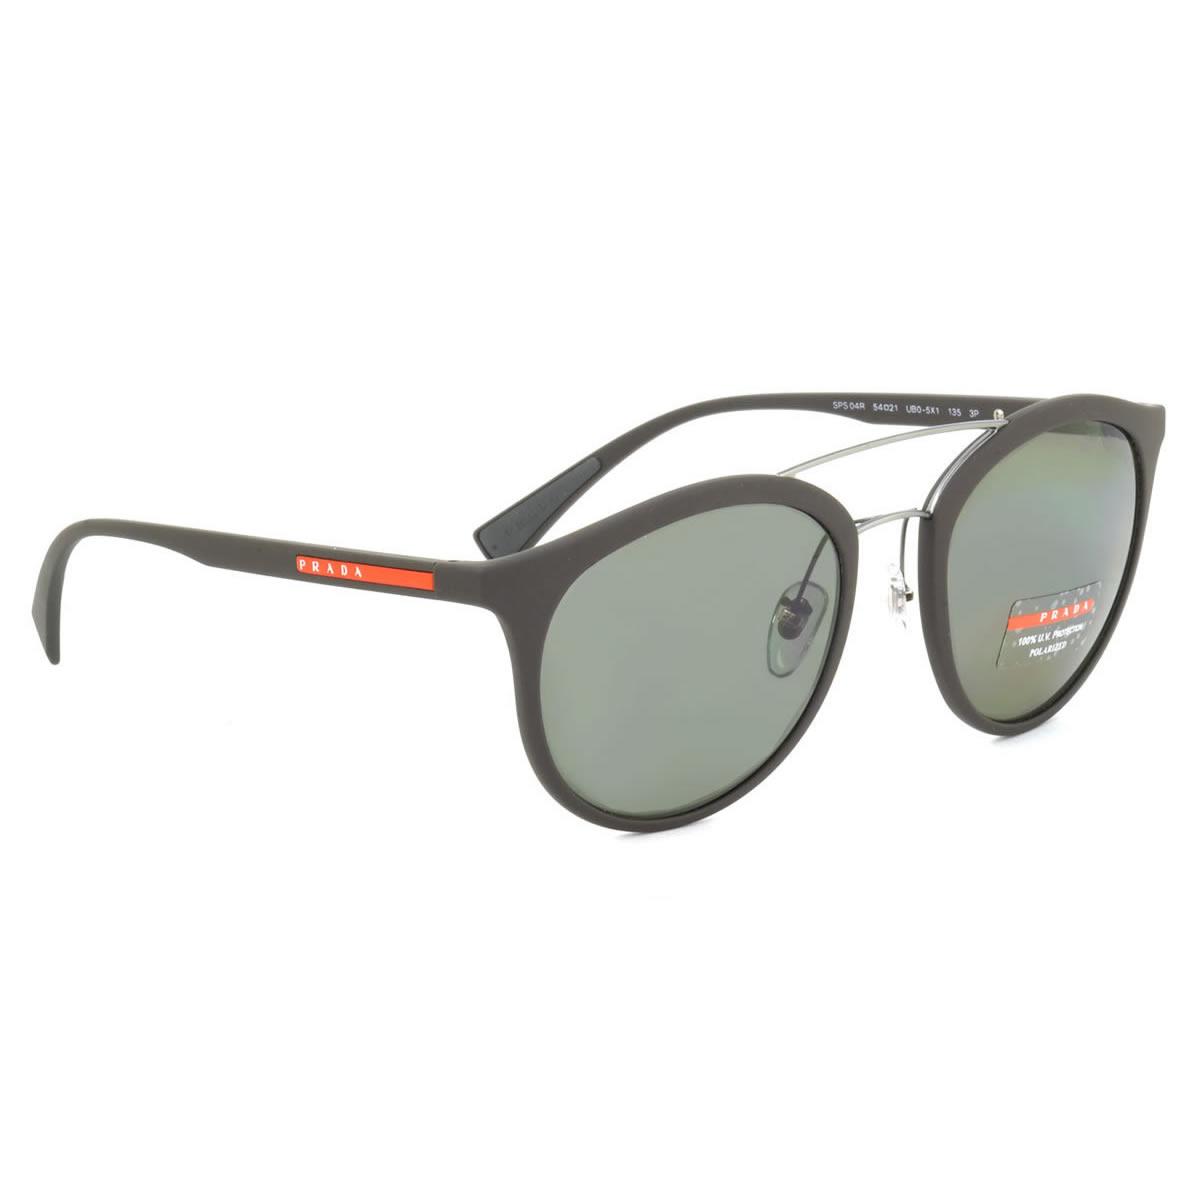 db2e664ba58 (PRADA SPORT) sunglasses PS04RS UB05X1 54 size PRADA SPORTS two-bridge  polarized lenses Polarized Sunglasses rubber frame PRADASPORT men women